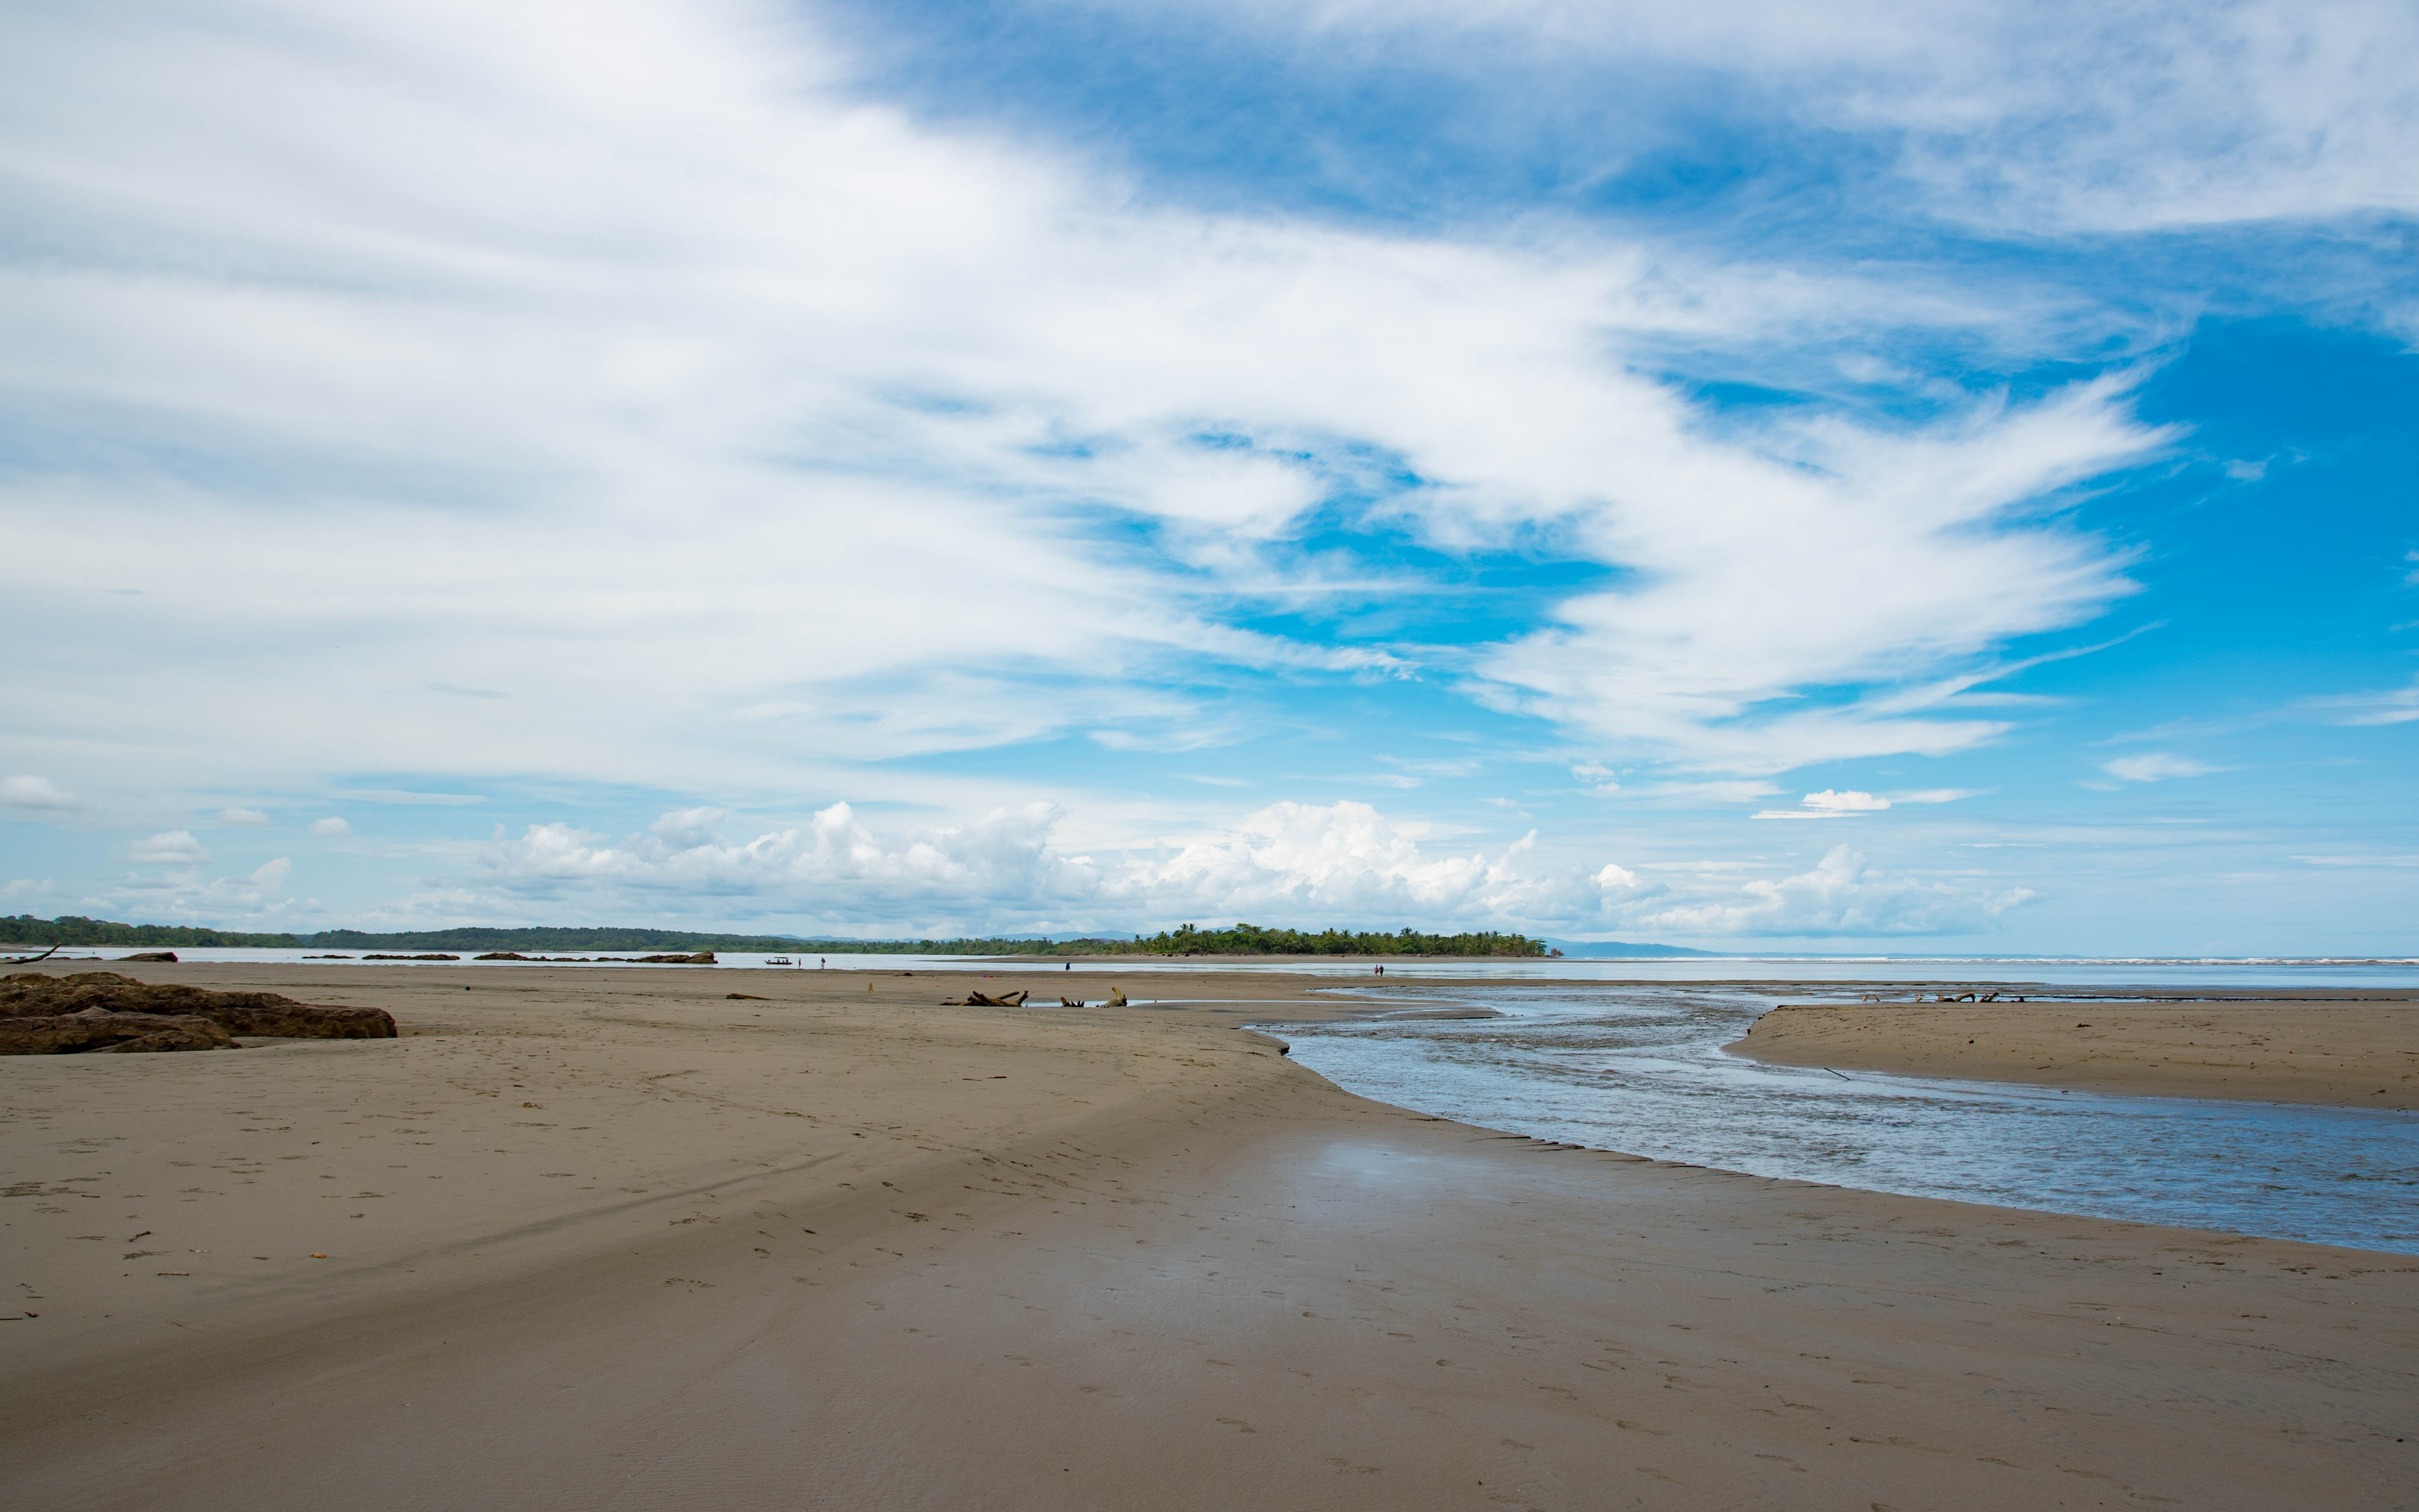 Playa Tortuga, Costa Rica